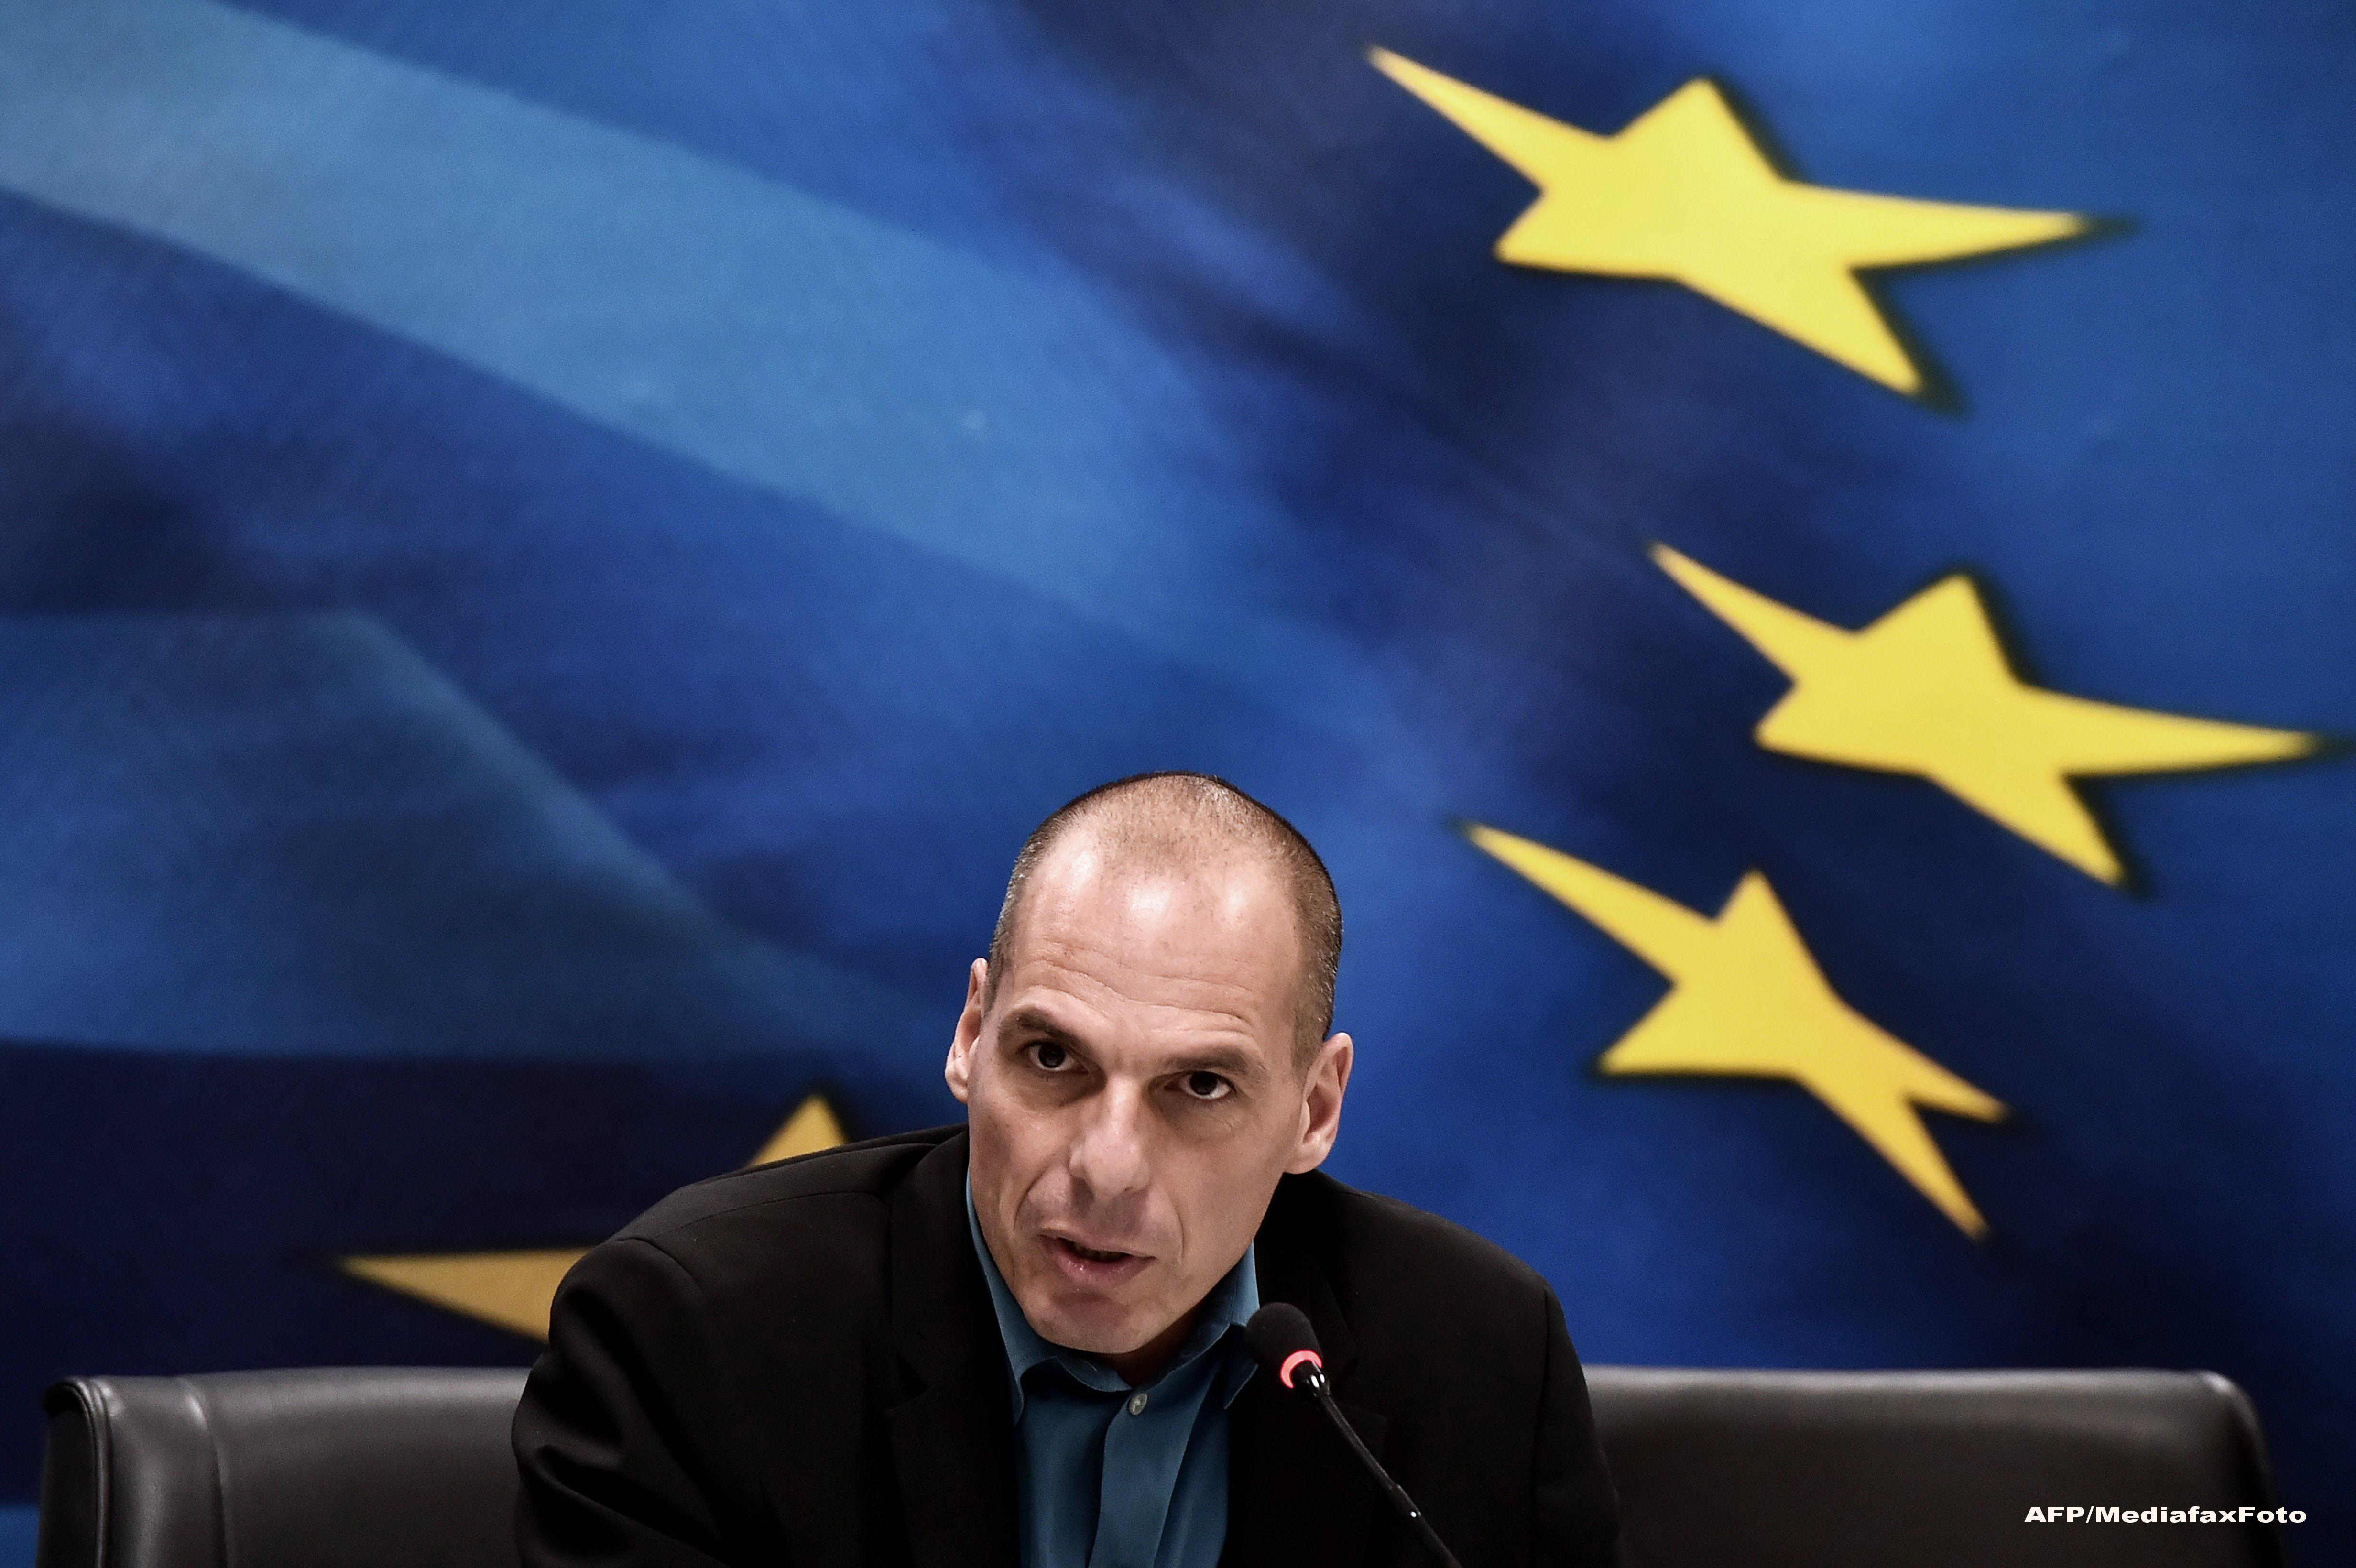 Reprezentantul Greciei la FMI a demisionat, dupa o intalnire dintre Varoufakis si Christine Lagarde